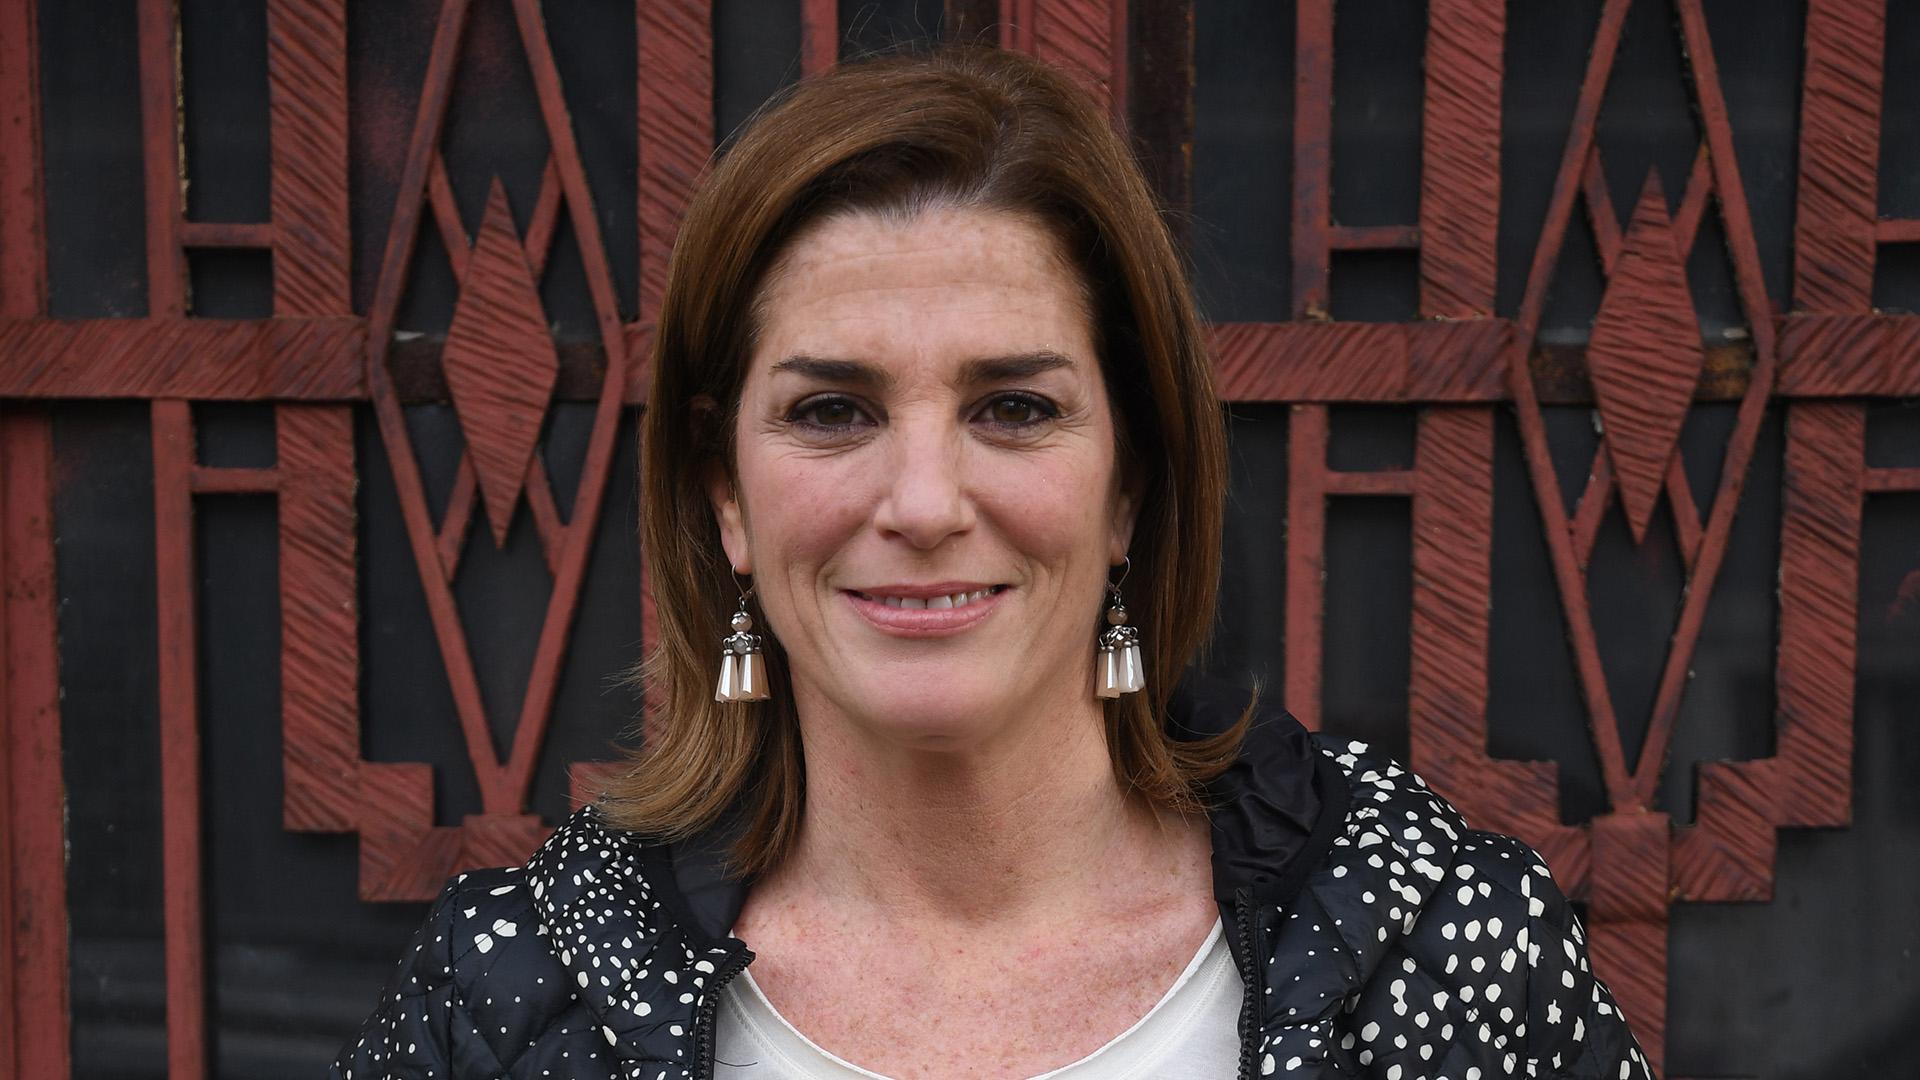 Bébora Pérez Volpin falleció el martes 6 de febrero cerca de las 17 horas